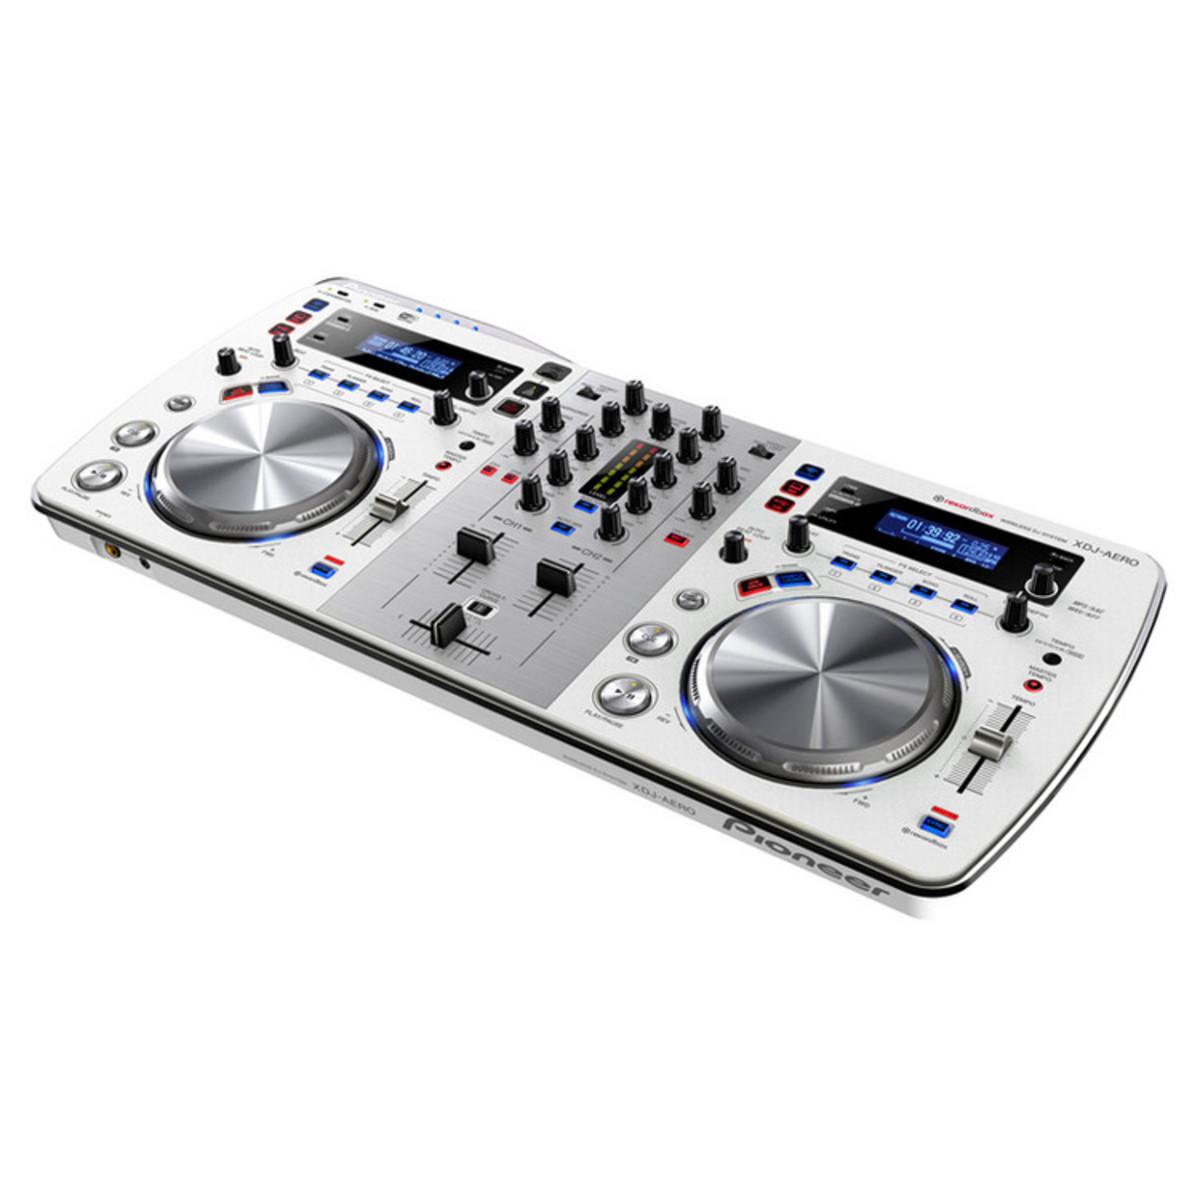 Pioneer XDJ-AERO DJ Controller Drivers for Windows 7